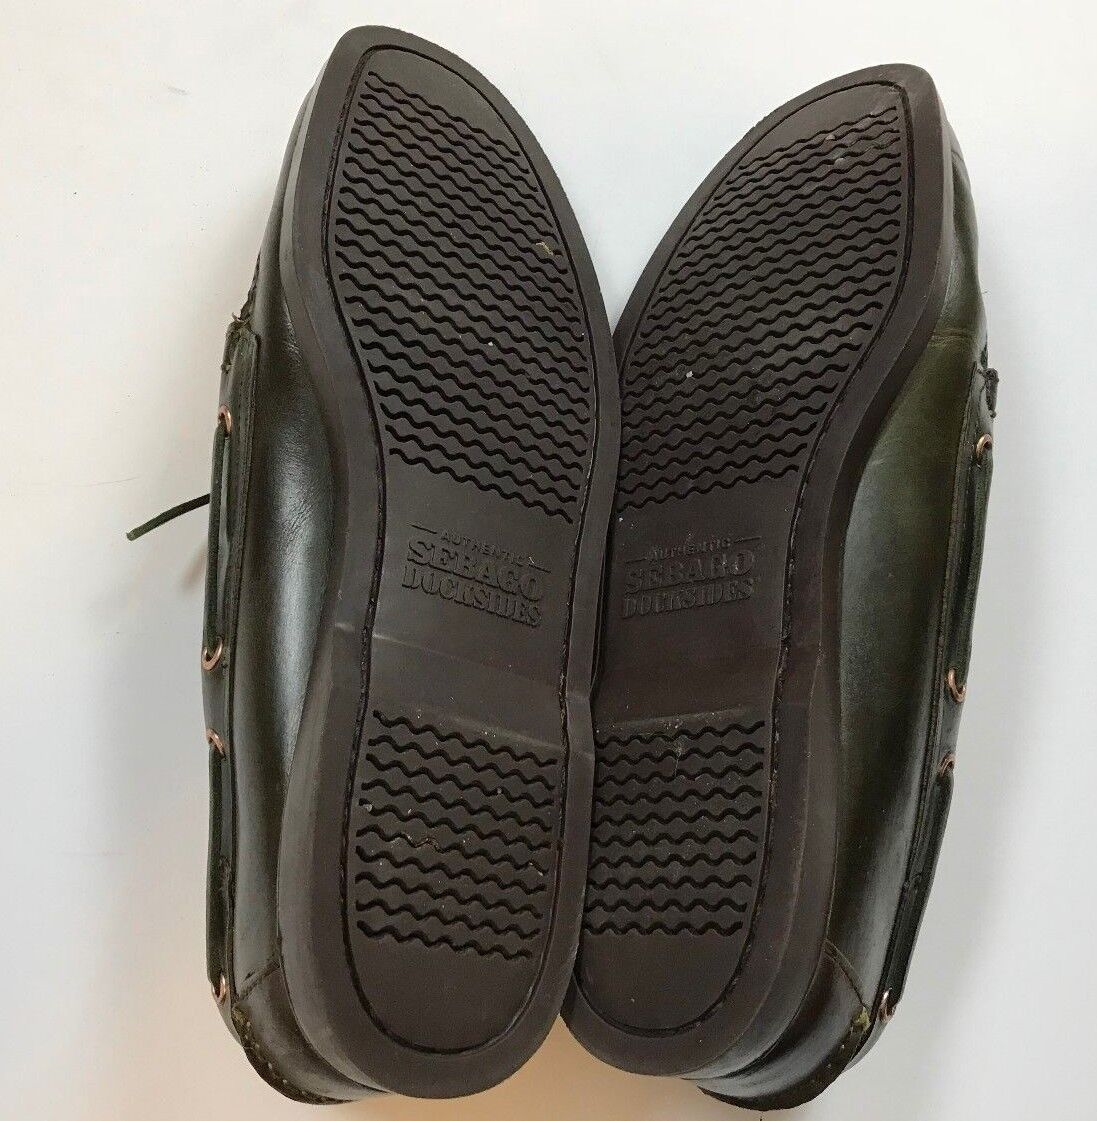 Sebago Moc Docksides  Uomo Leder Schuhes Dark Braun Casual Moc Sebago Toe Loafers Größe 12M b222c1